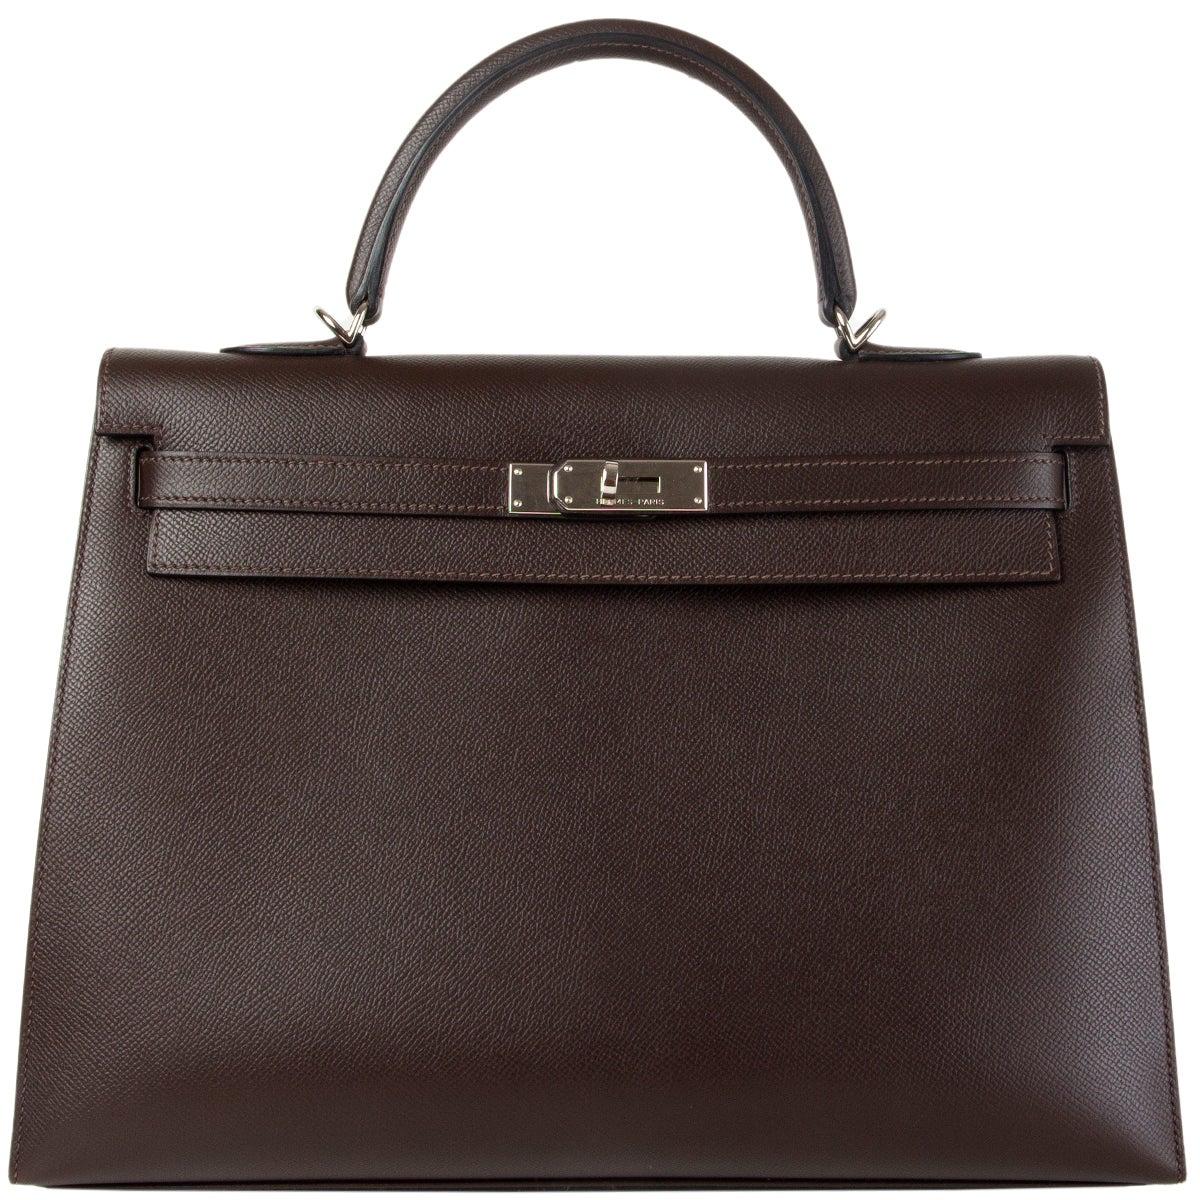 HERMES Chocolat brown Epsom leather & Palladium KELLY 35 Sellier Bag